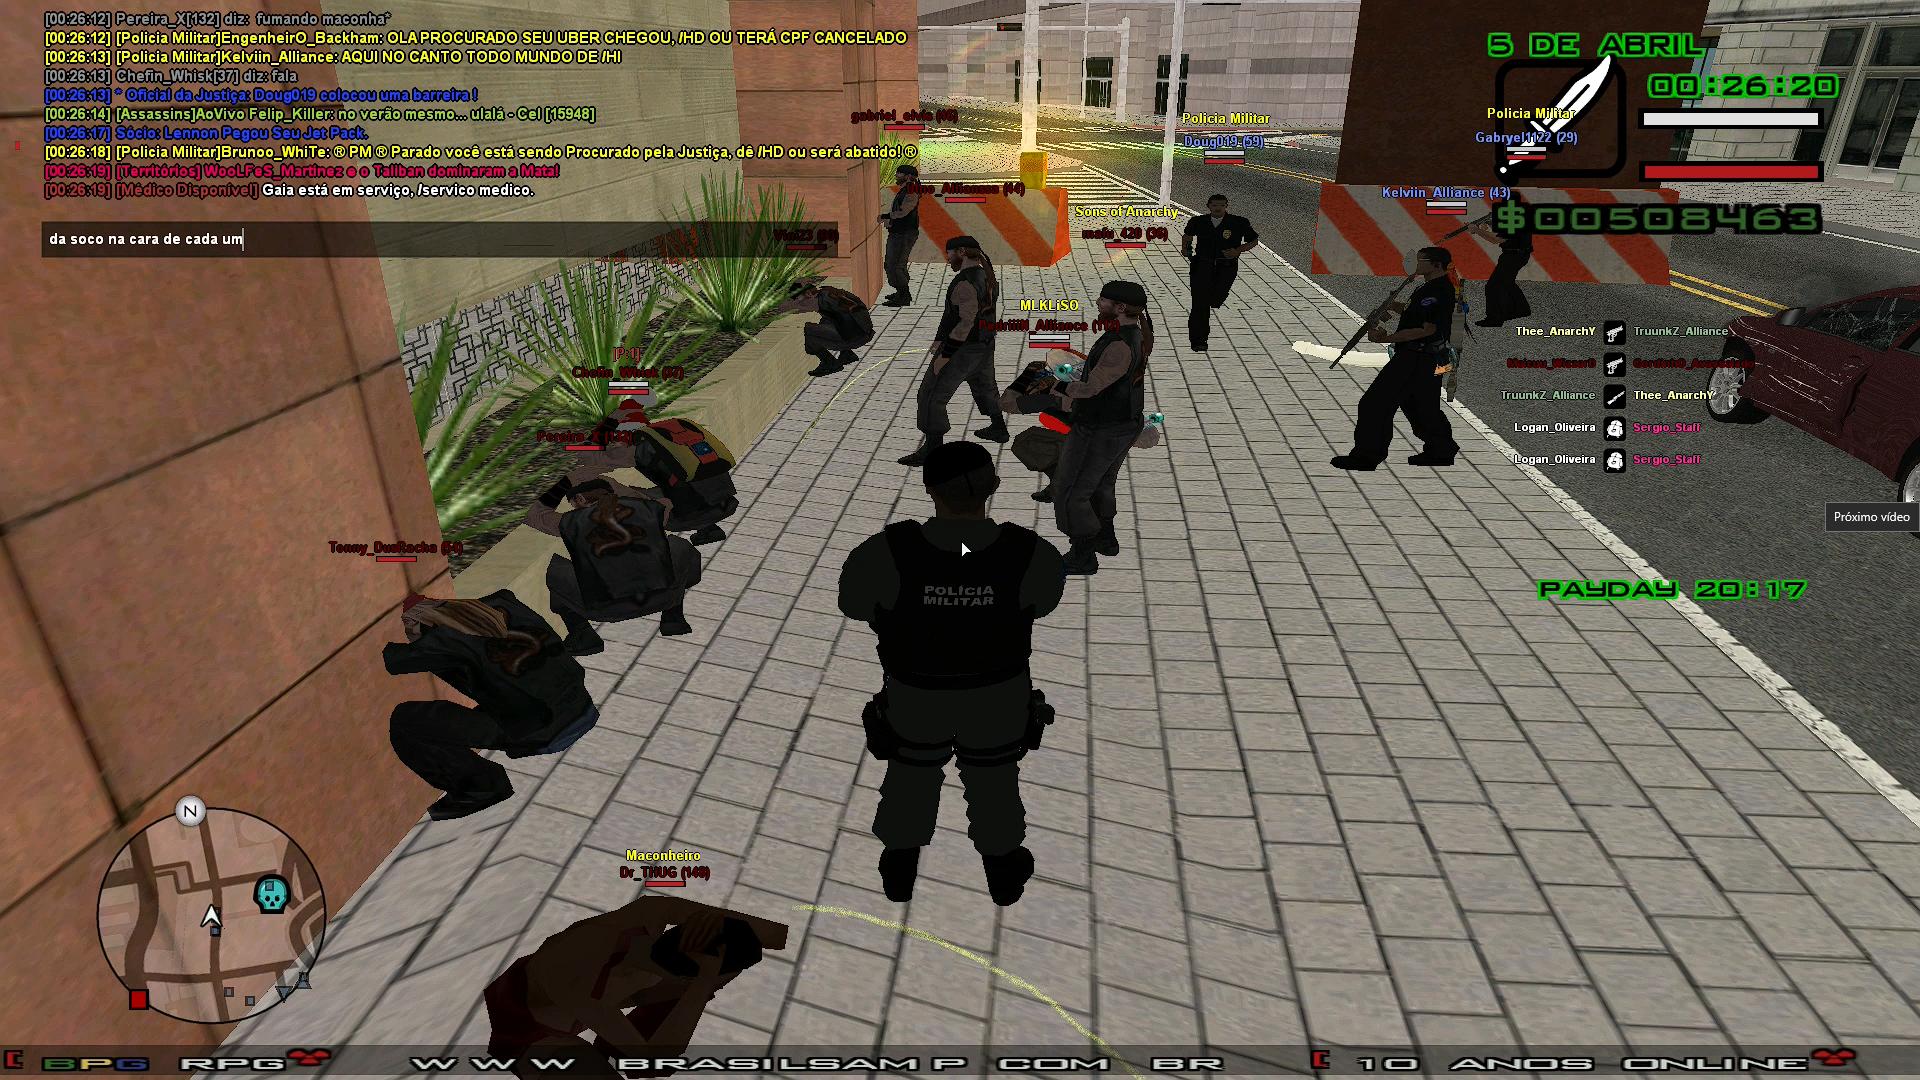 [04/04/2020]Policia Militar lider: Brunoo_WhiTe Sem_t%C3%ADtulo